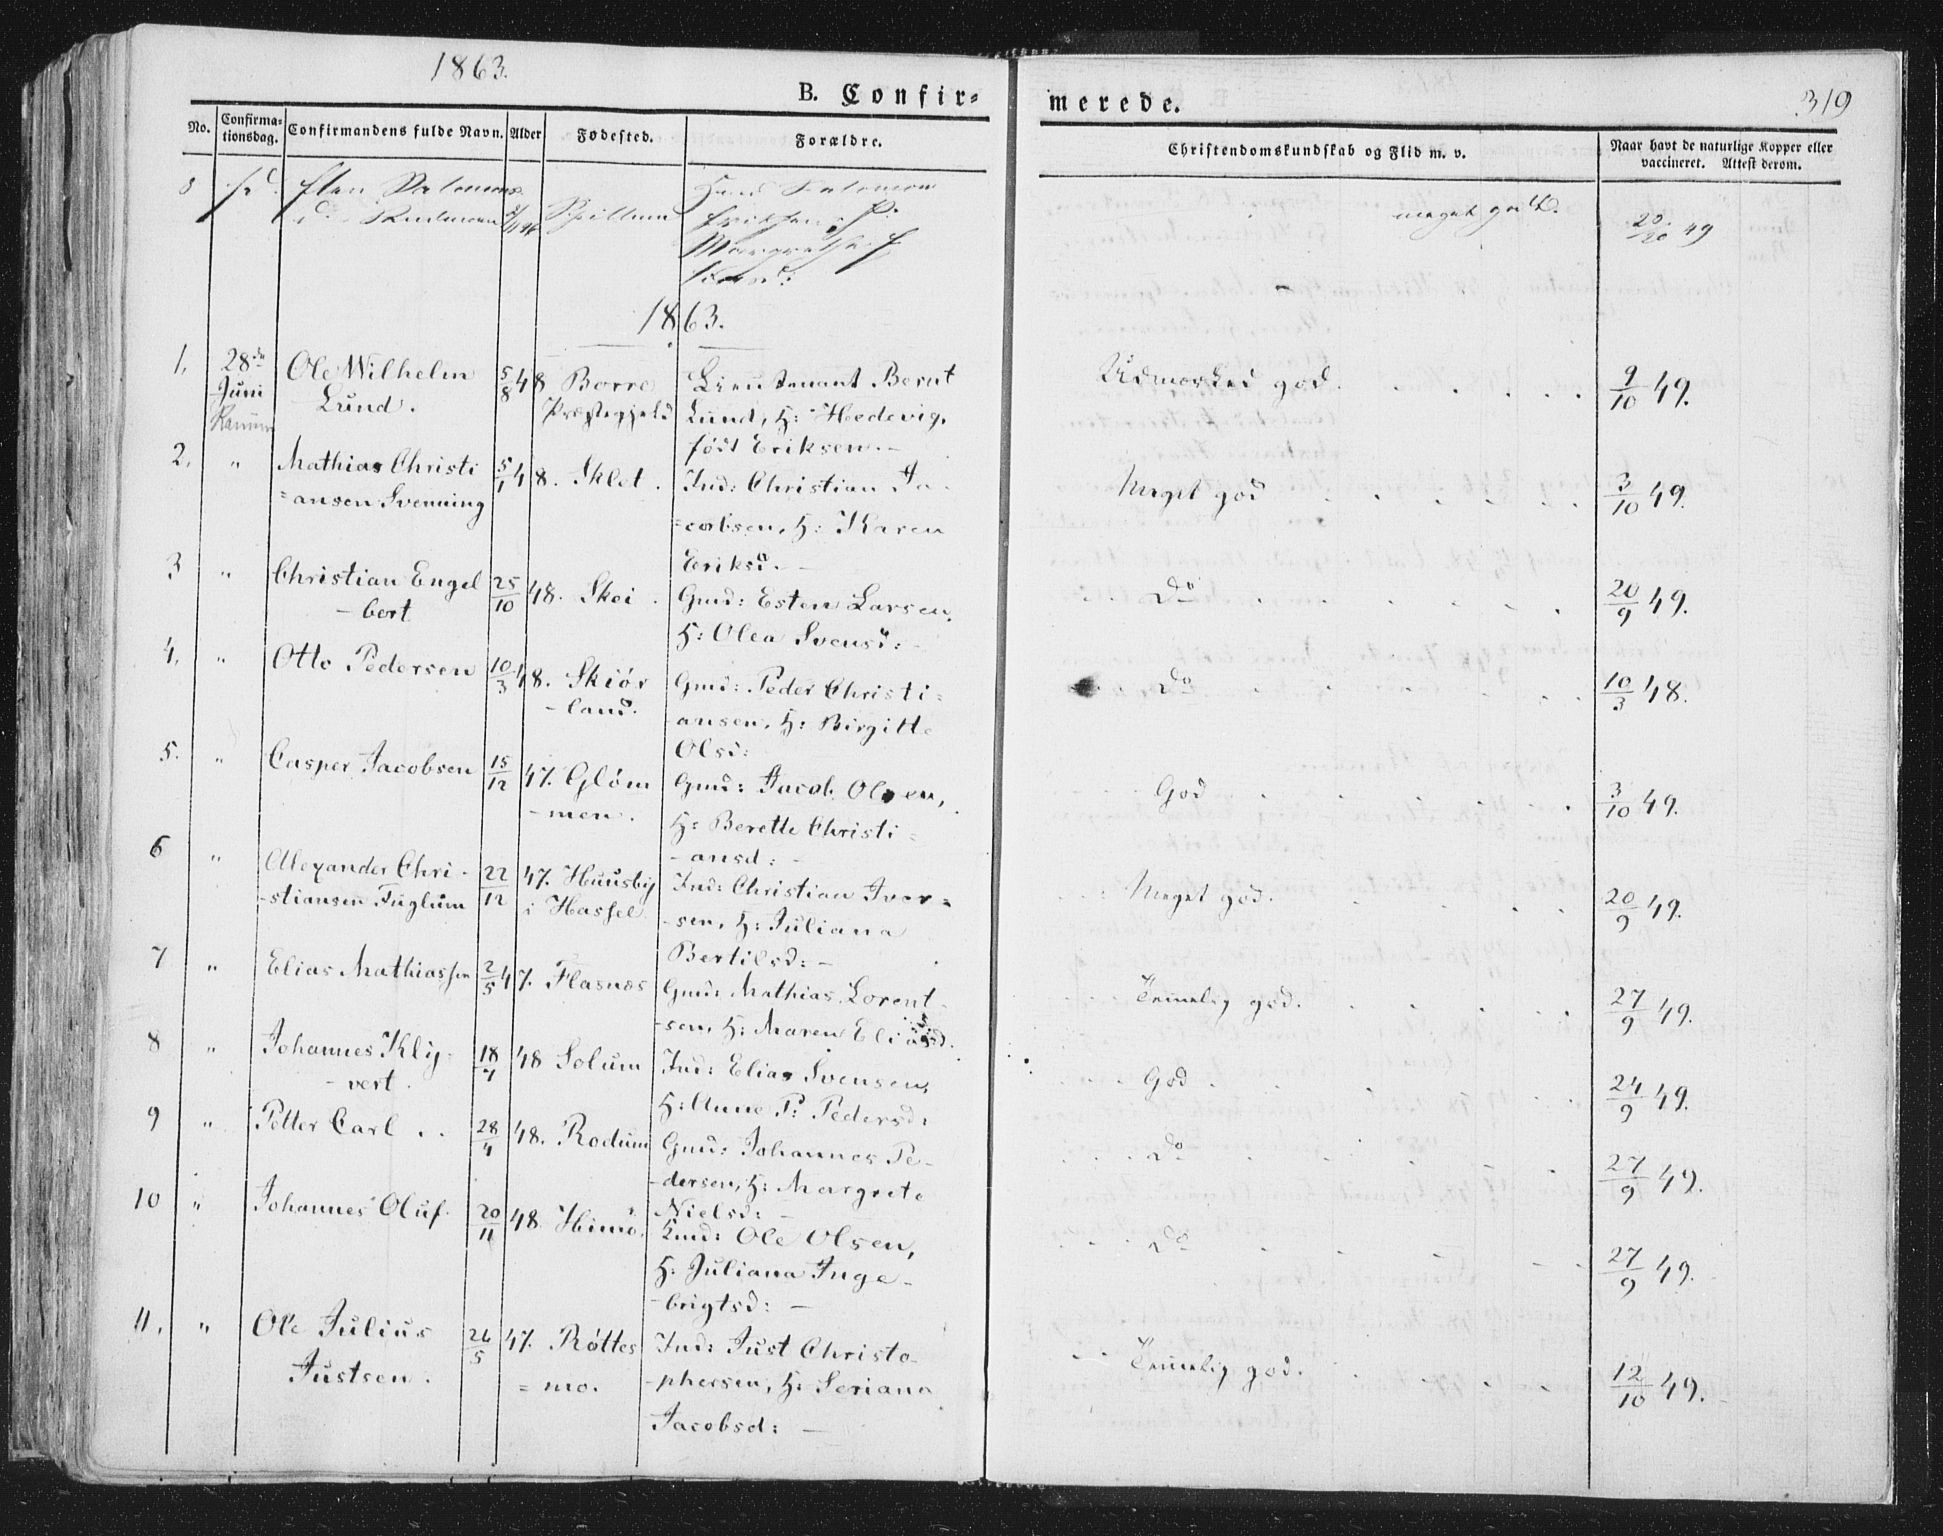 SAT, Ministerialprotokoller, klokkerbøker og fødselsregistre - Nord-Trøndelag, 764/L0551: Ministerialbok nr. 764A07a, 1824-1864, s. 319